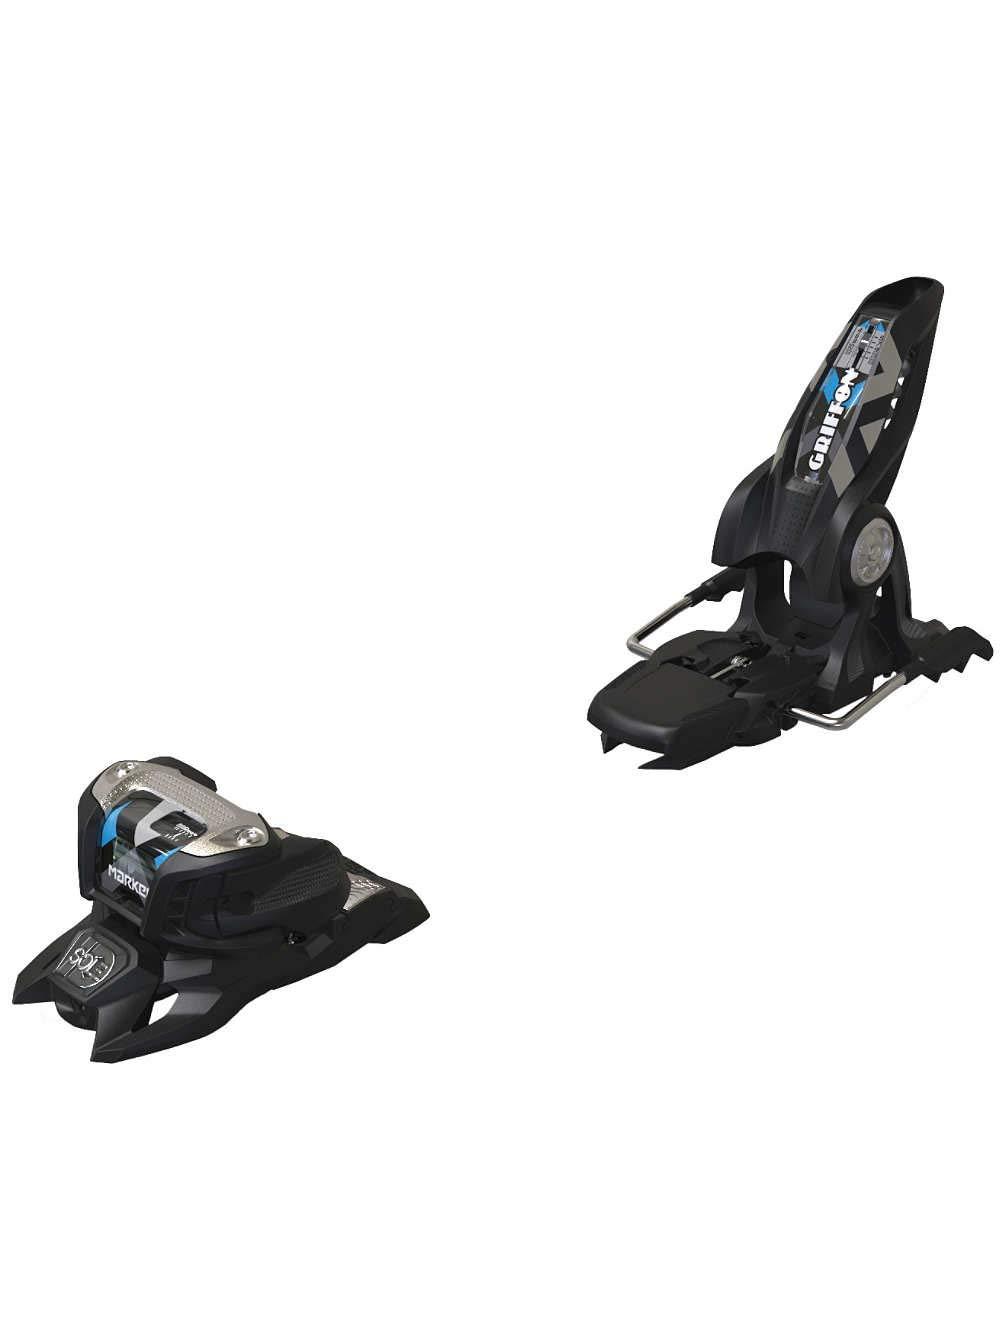 2019 Marker Griffon 13 ID B120 Adult Black Ski Bindings